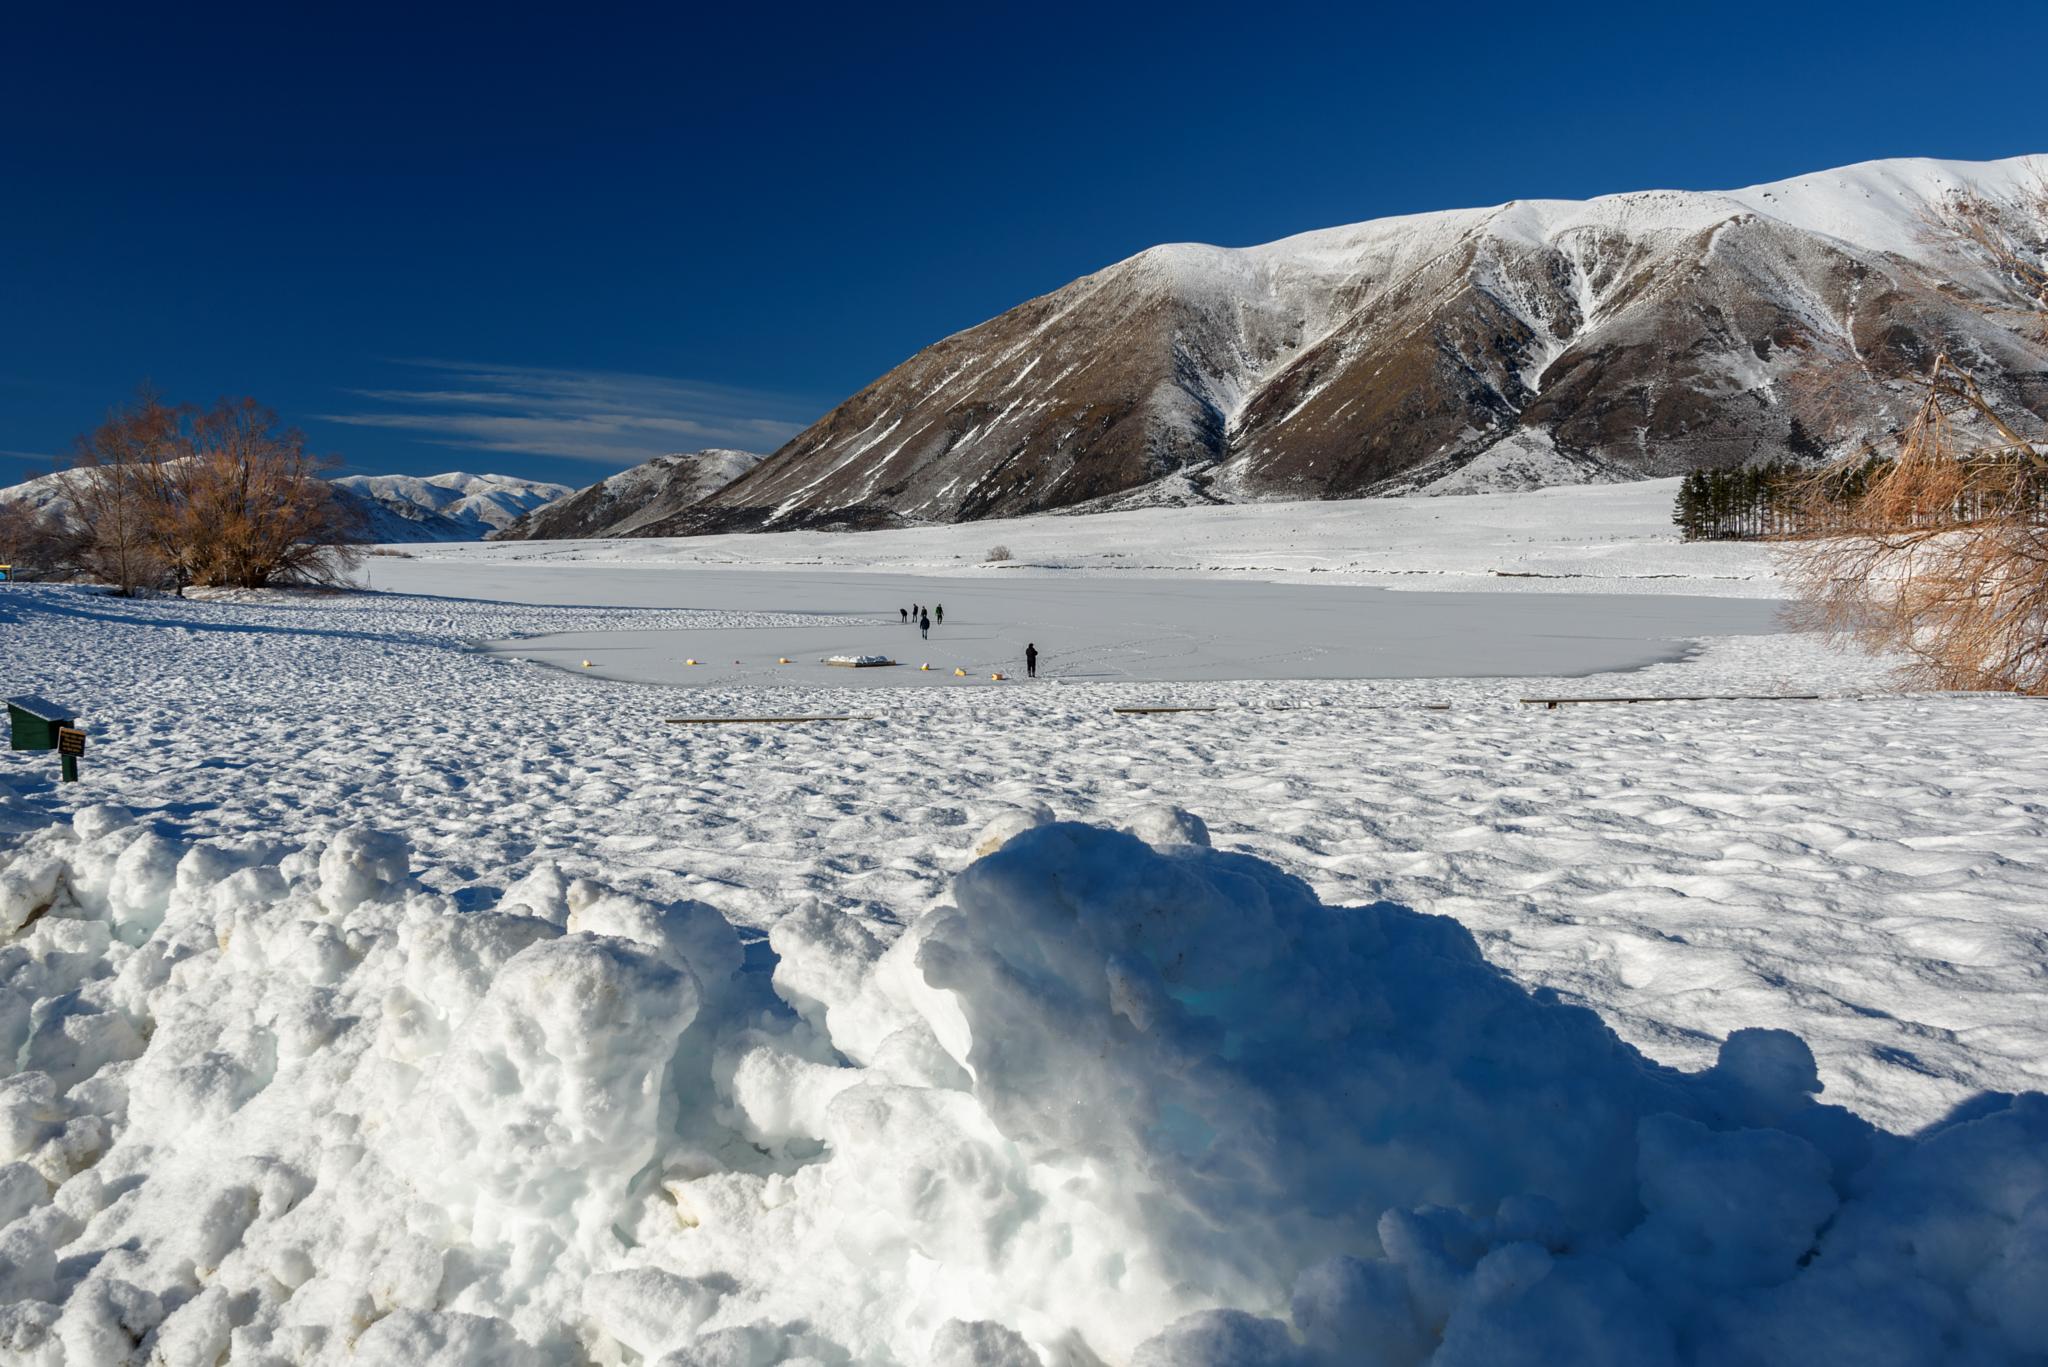 Ice Skating at Lake Camp by Jocelyn Kinghorn